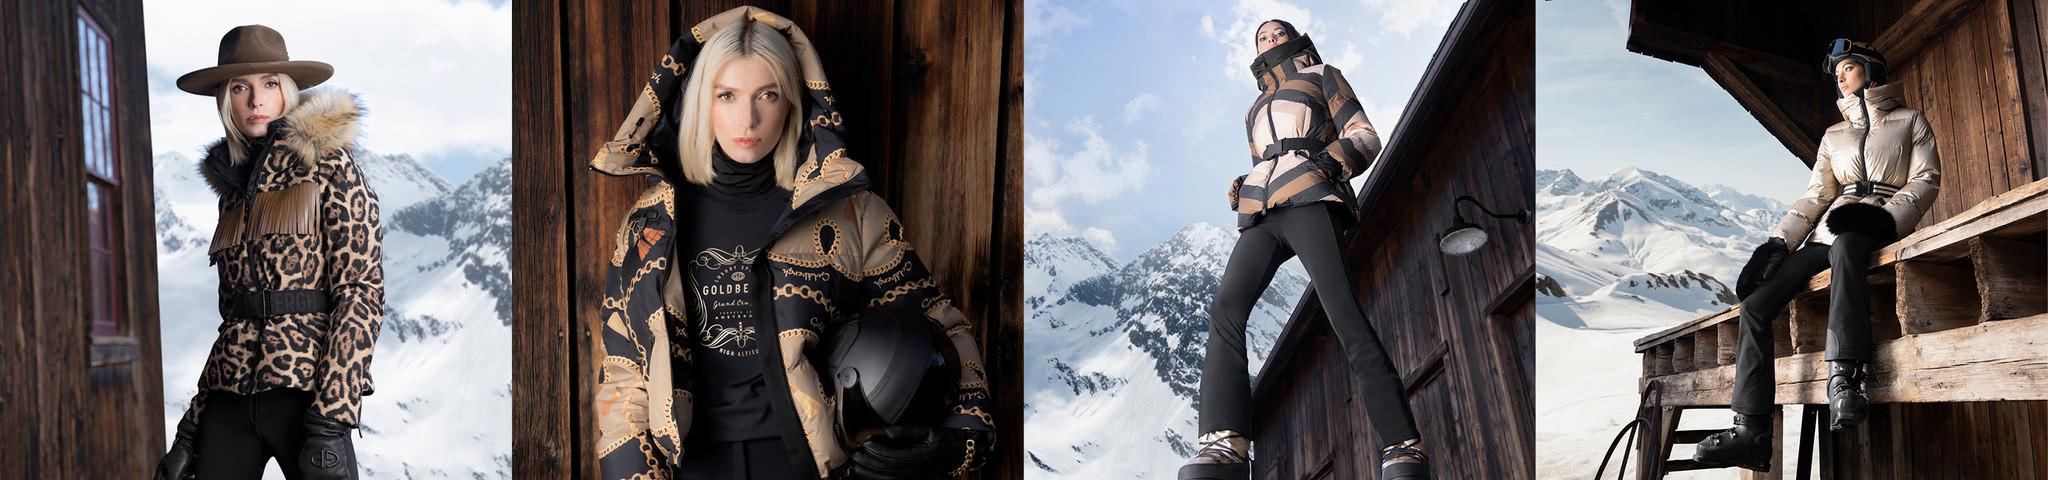 Skisuits